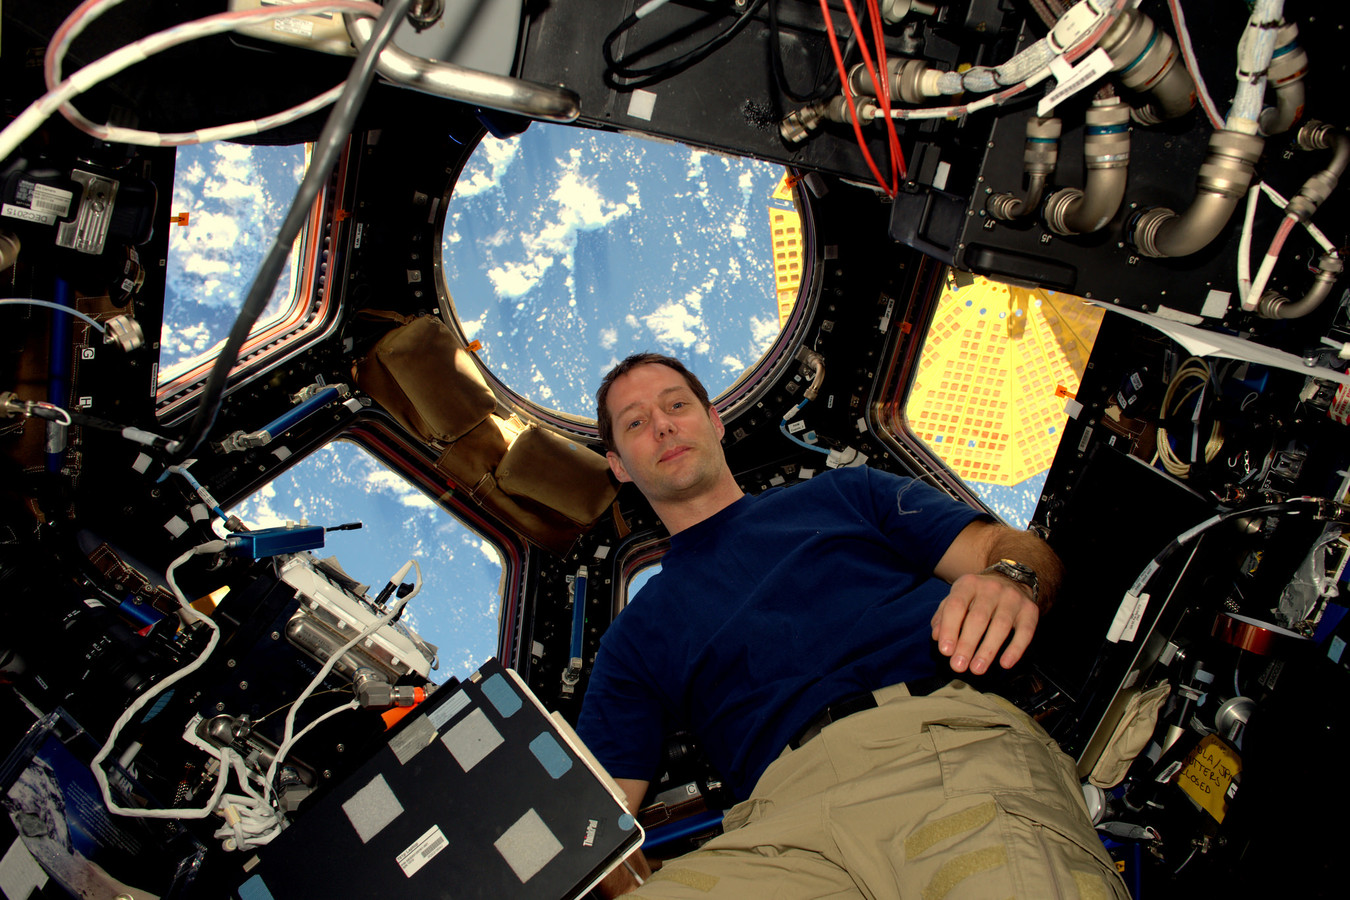 Thomas Pesquet à bord de l'ISS durant sa mission en 2016.